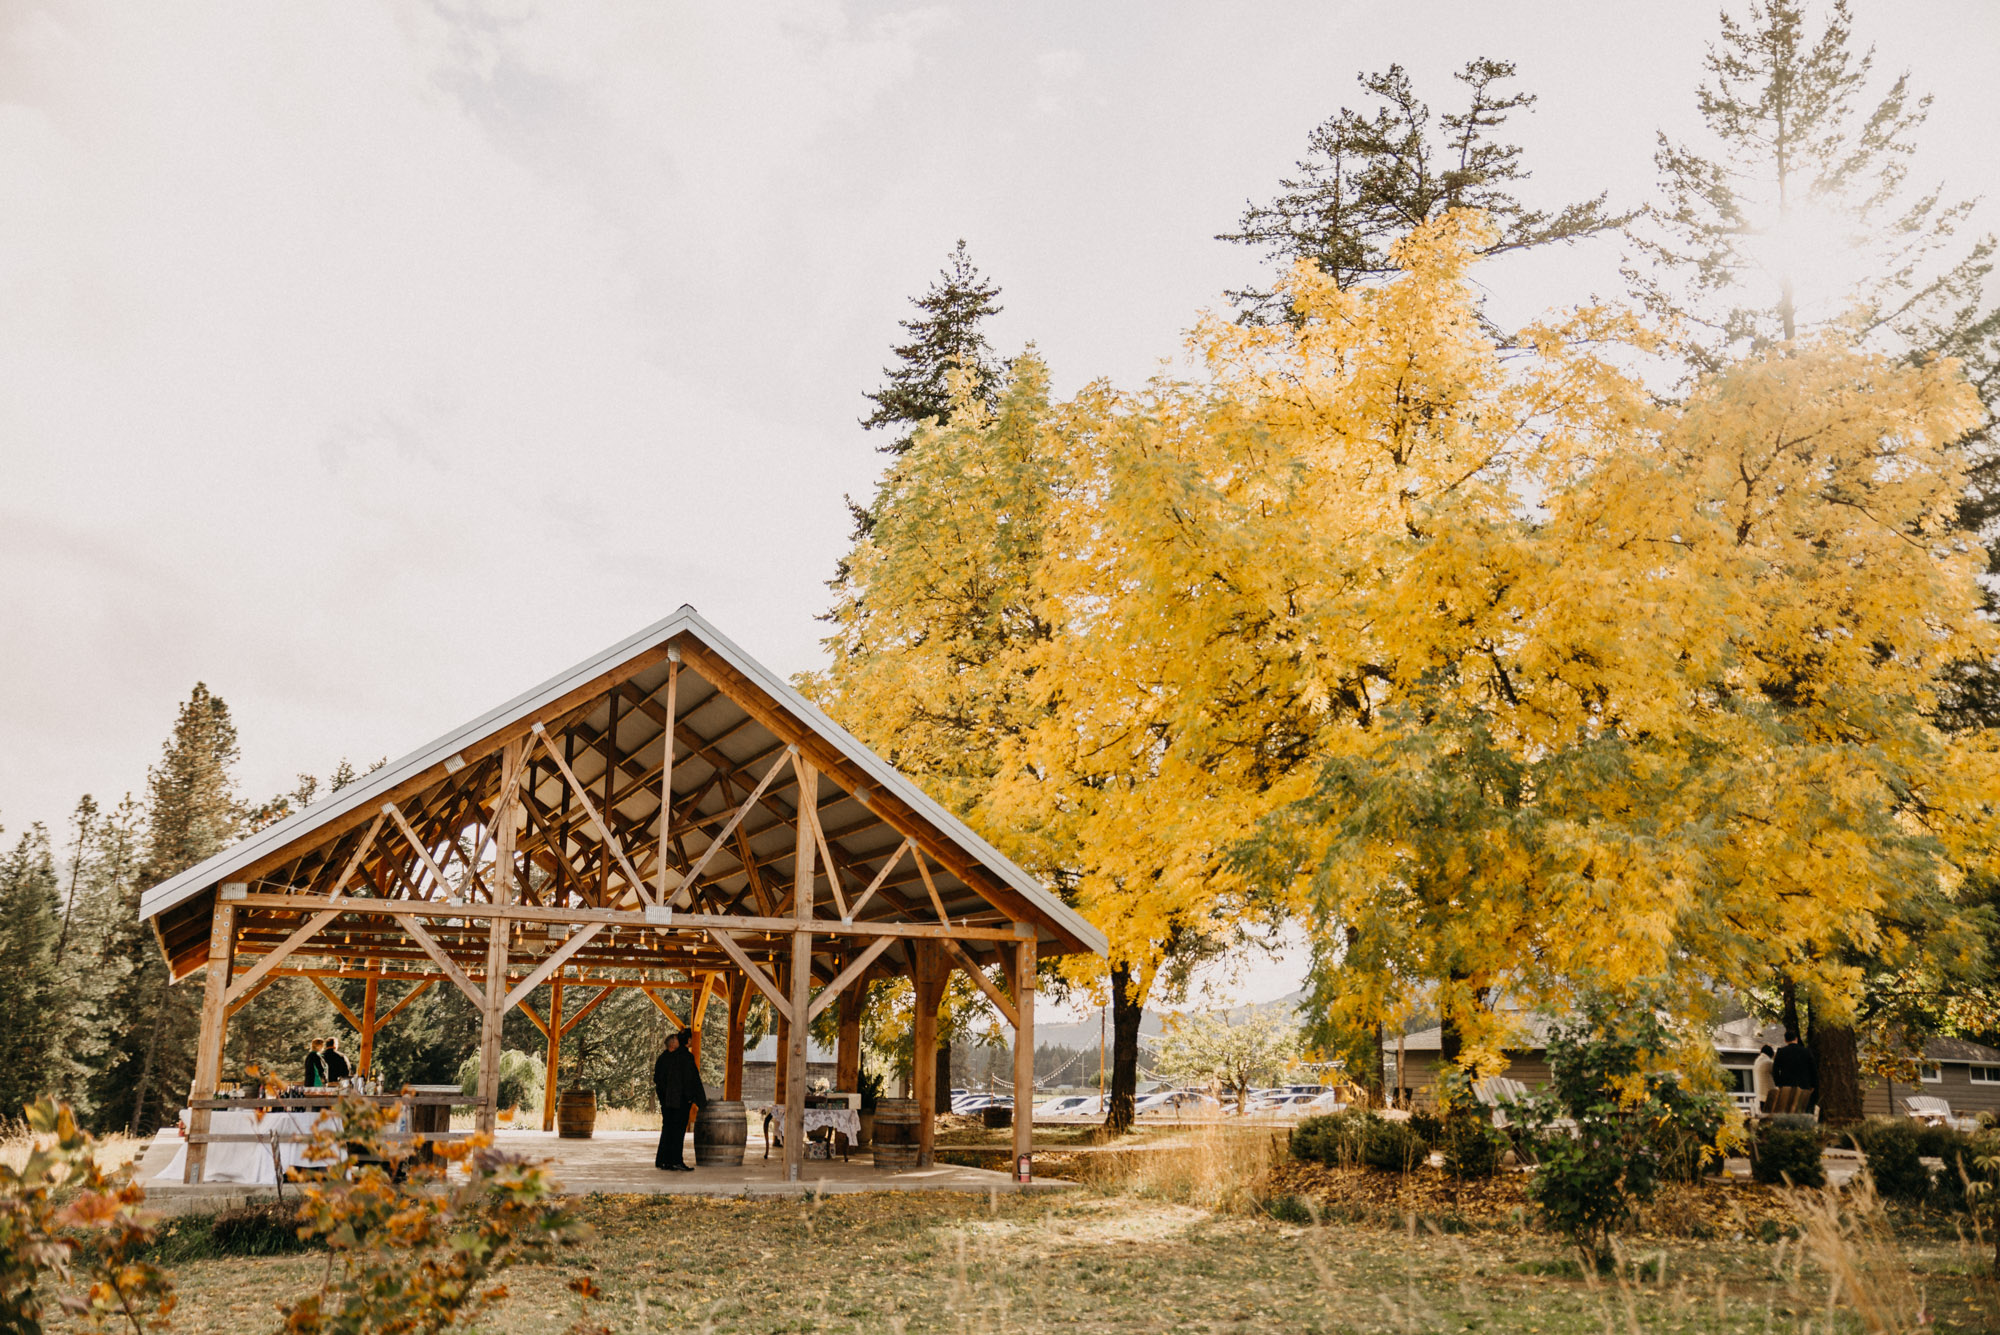 Getting-Ready-Swingset-Washington-Wedding-ringshot-5189.jpg